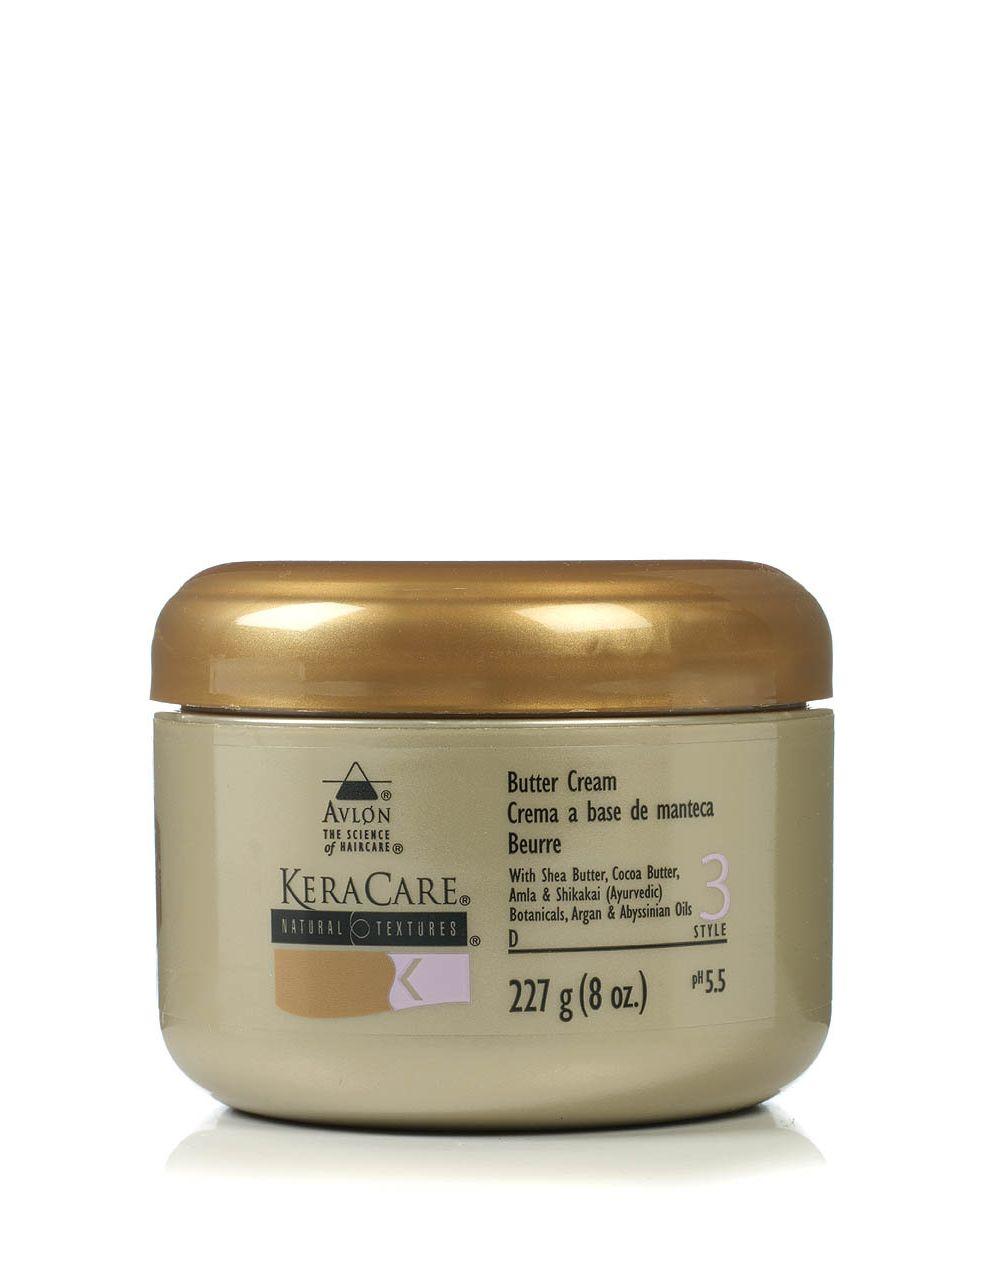 KeraCare Butter Cream